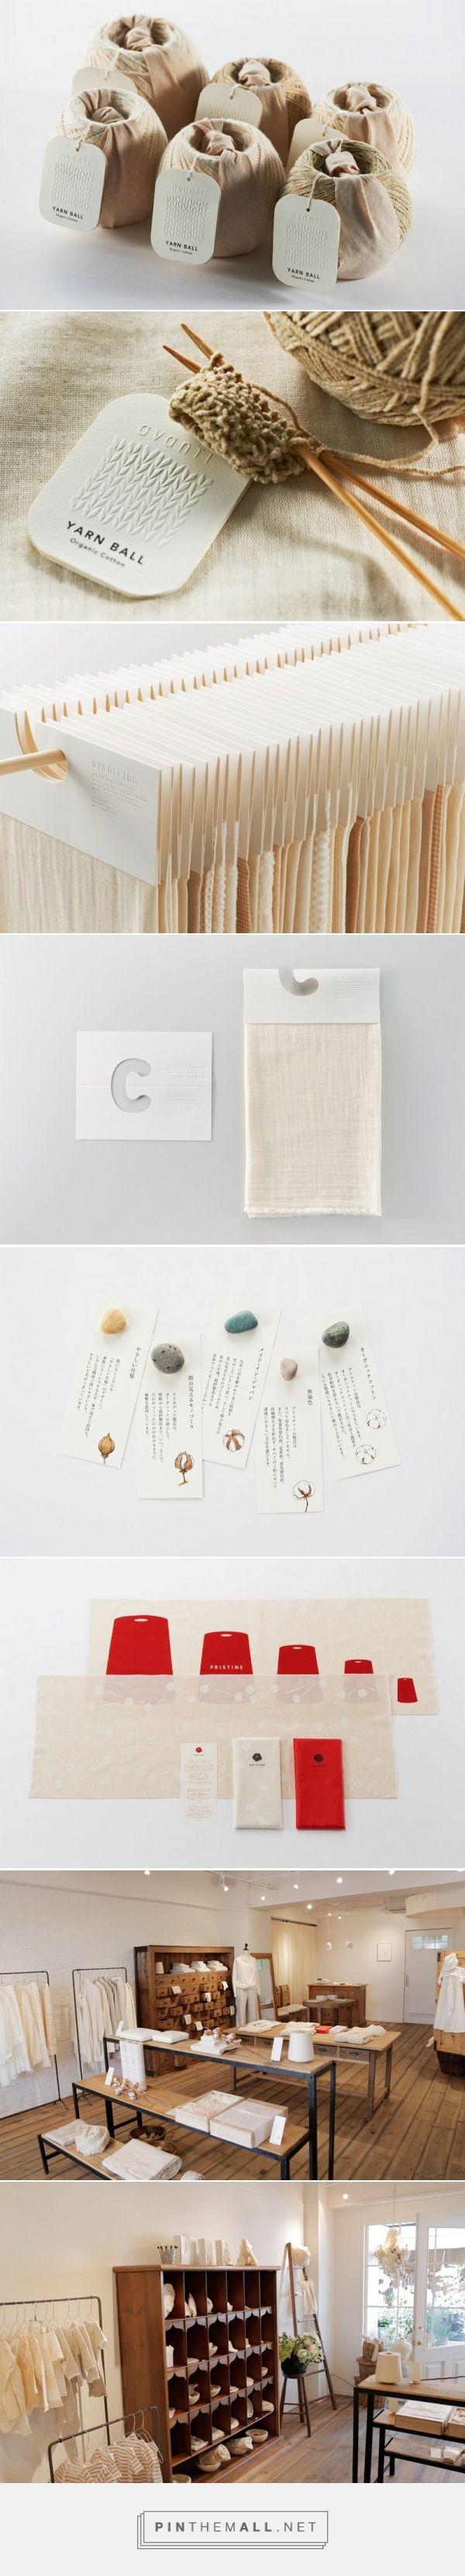 Identity For Organic Cotton Brand Pristine by Daigo Daikoku | Spoon & Tamago